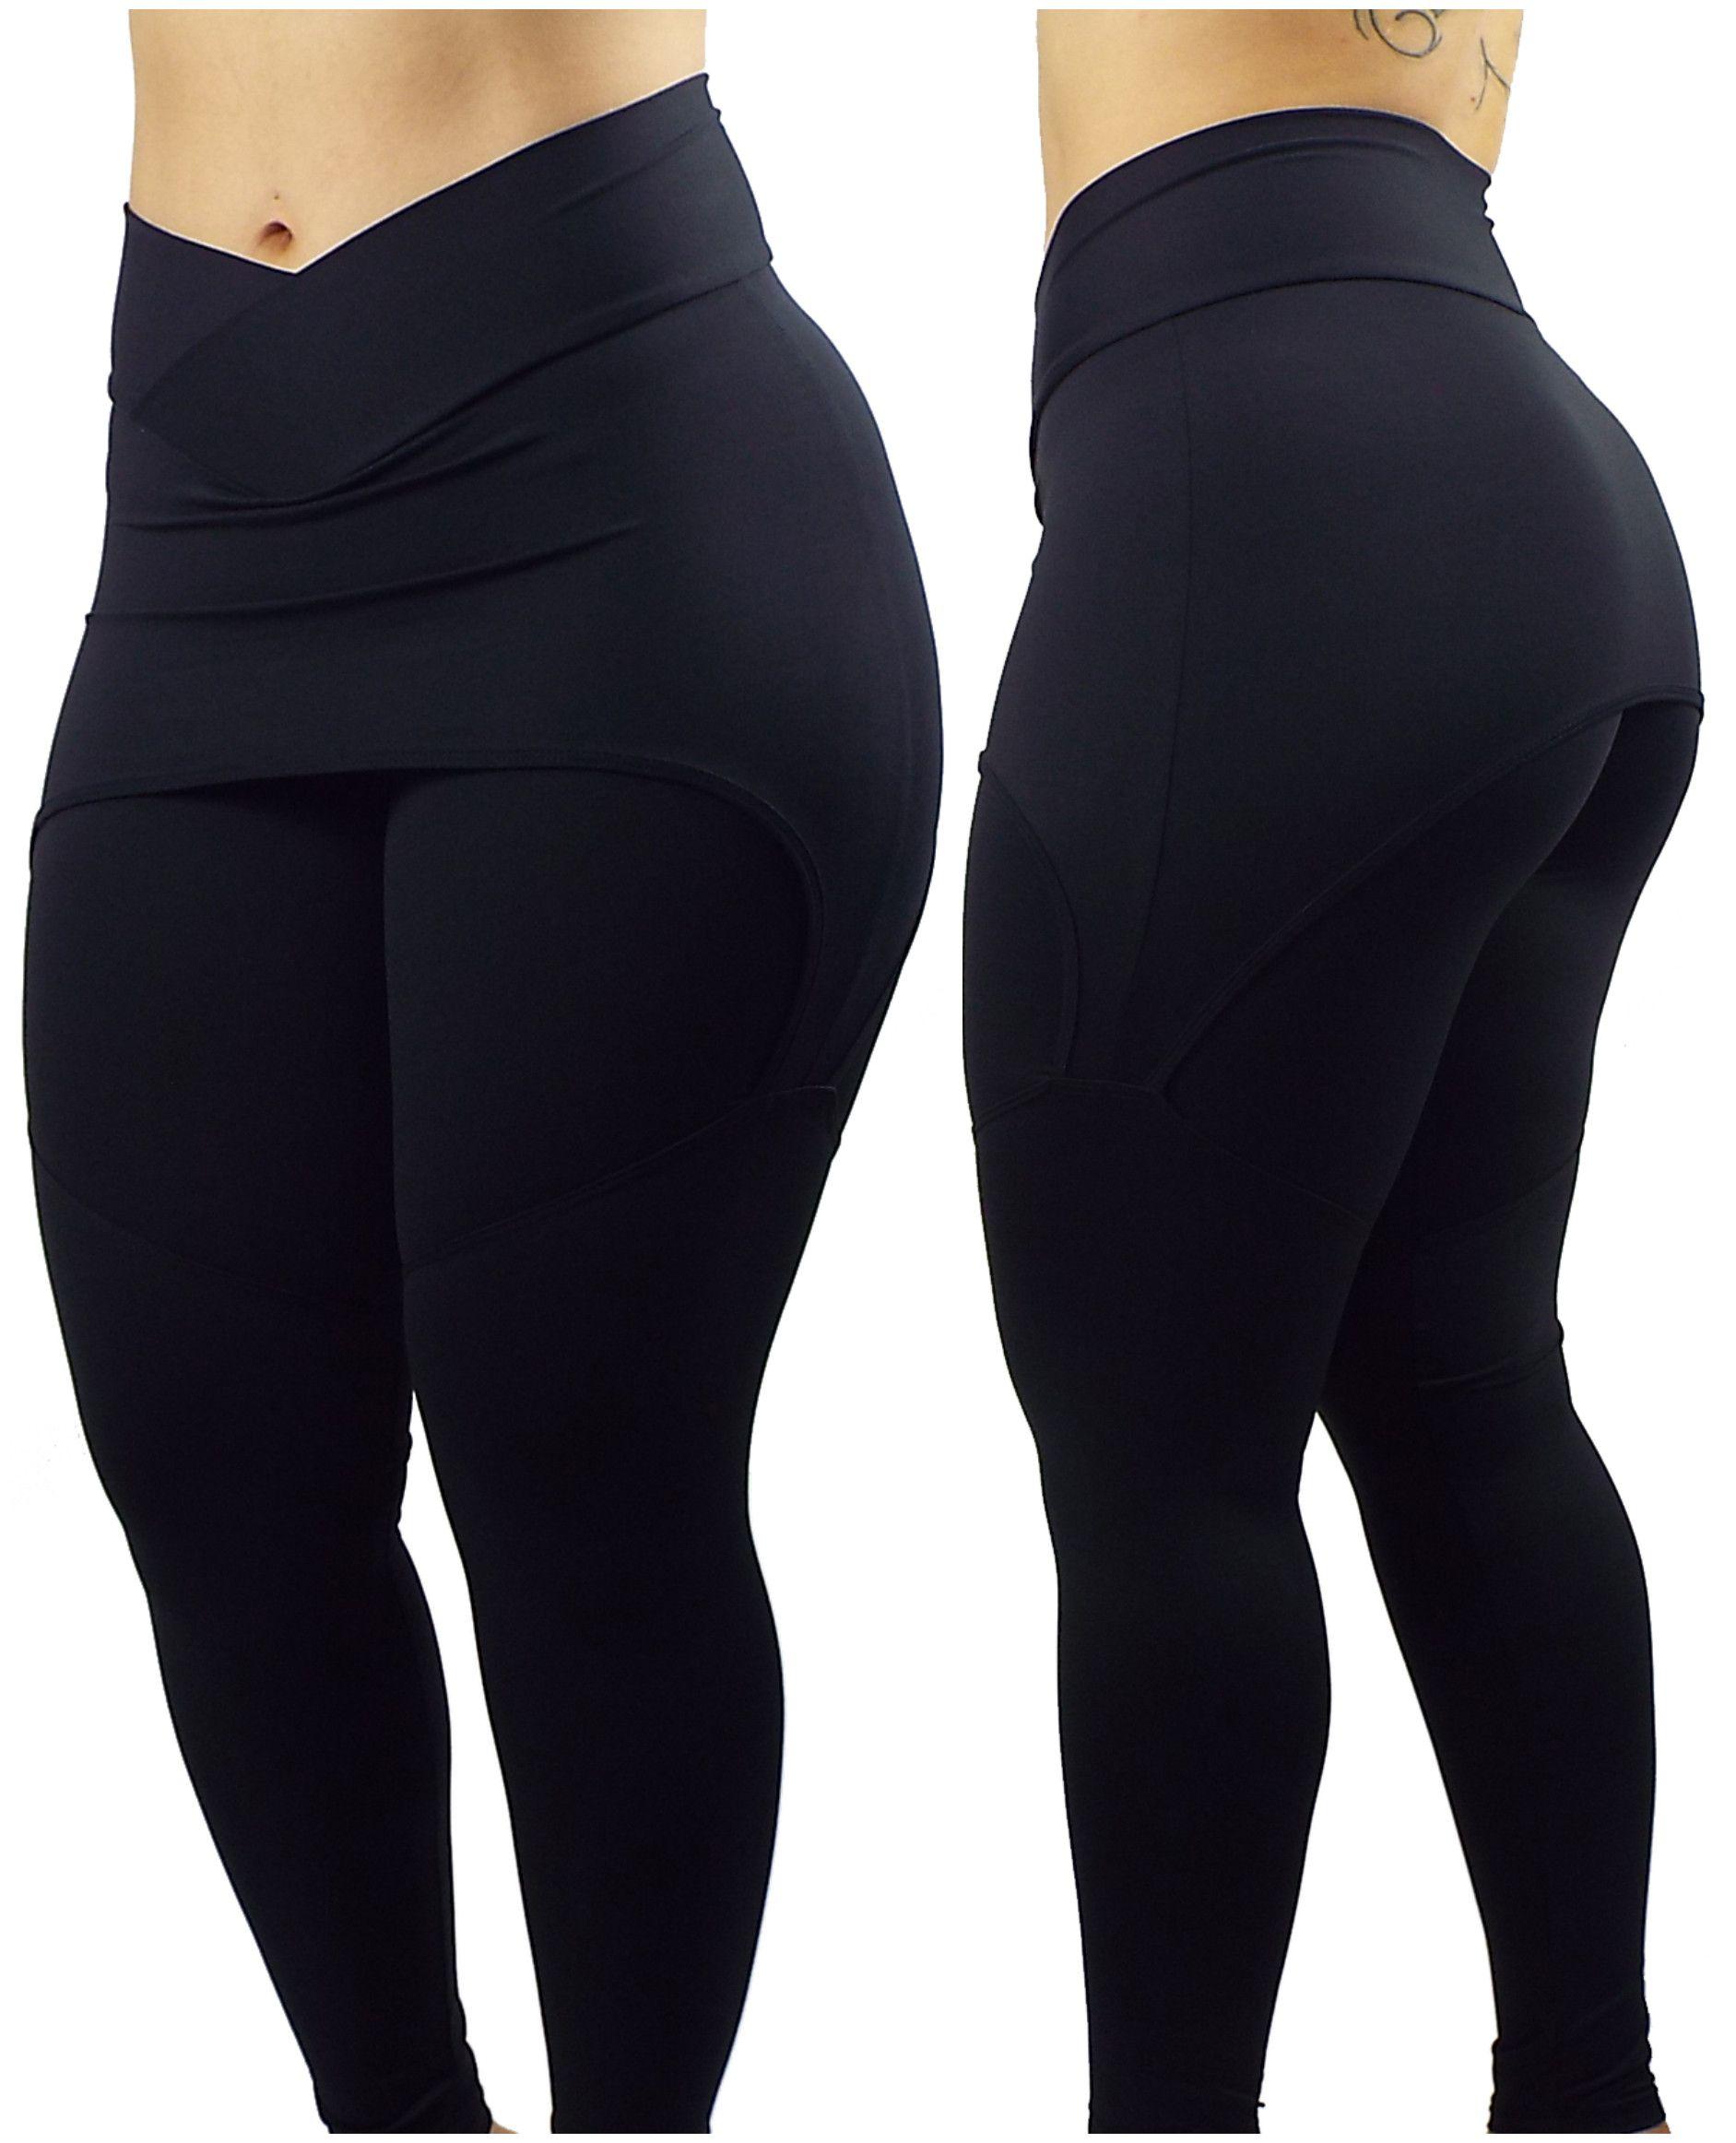 b00ed1468 Legging Com Saia La Seduzione Suplex Fitness Academia Grossa - R  98 ...